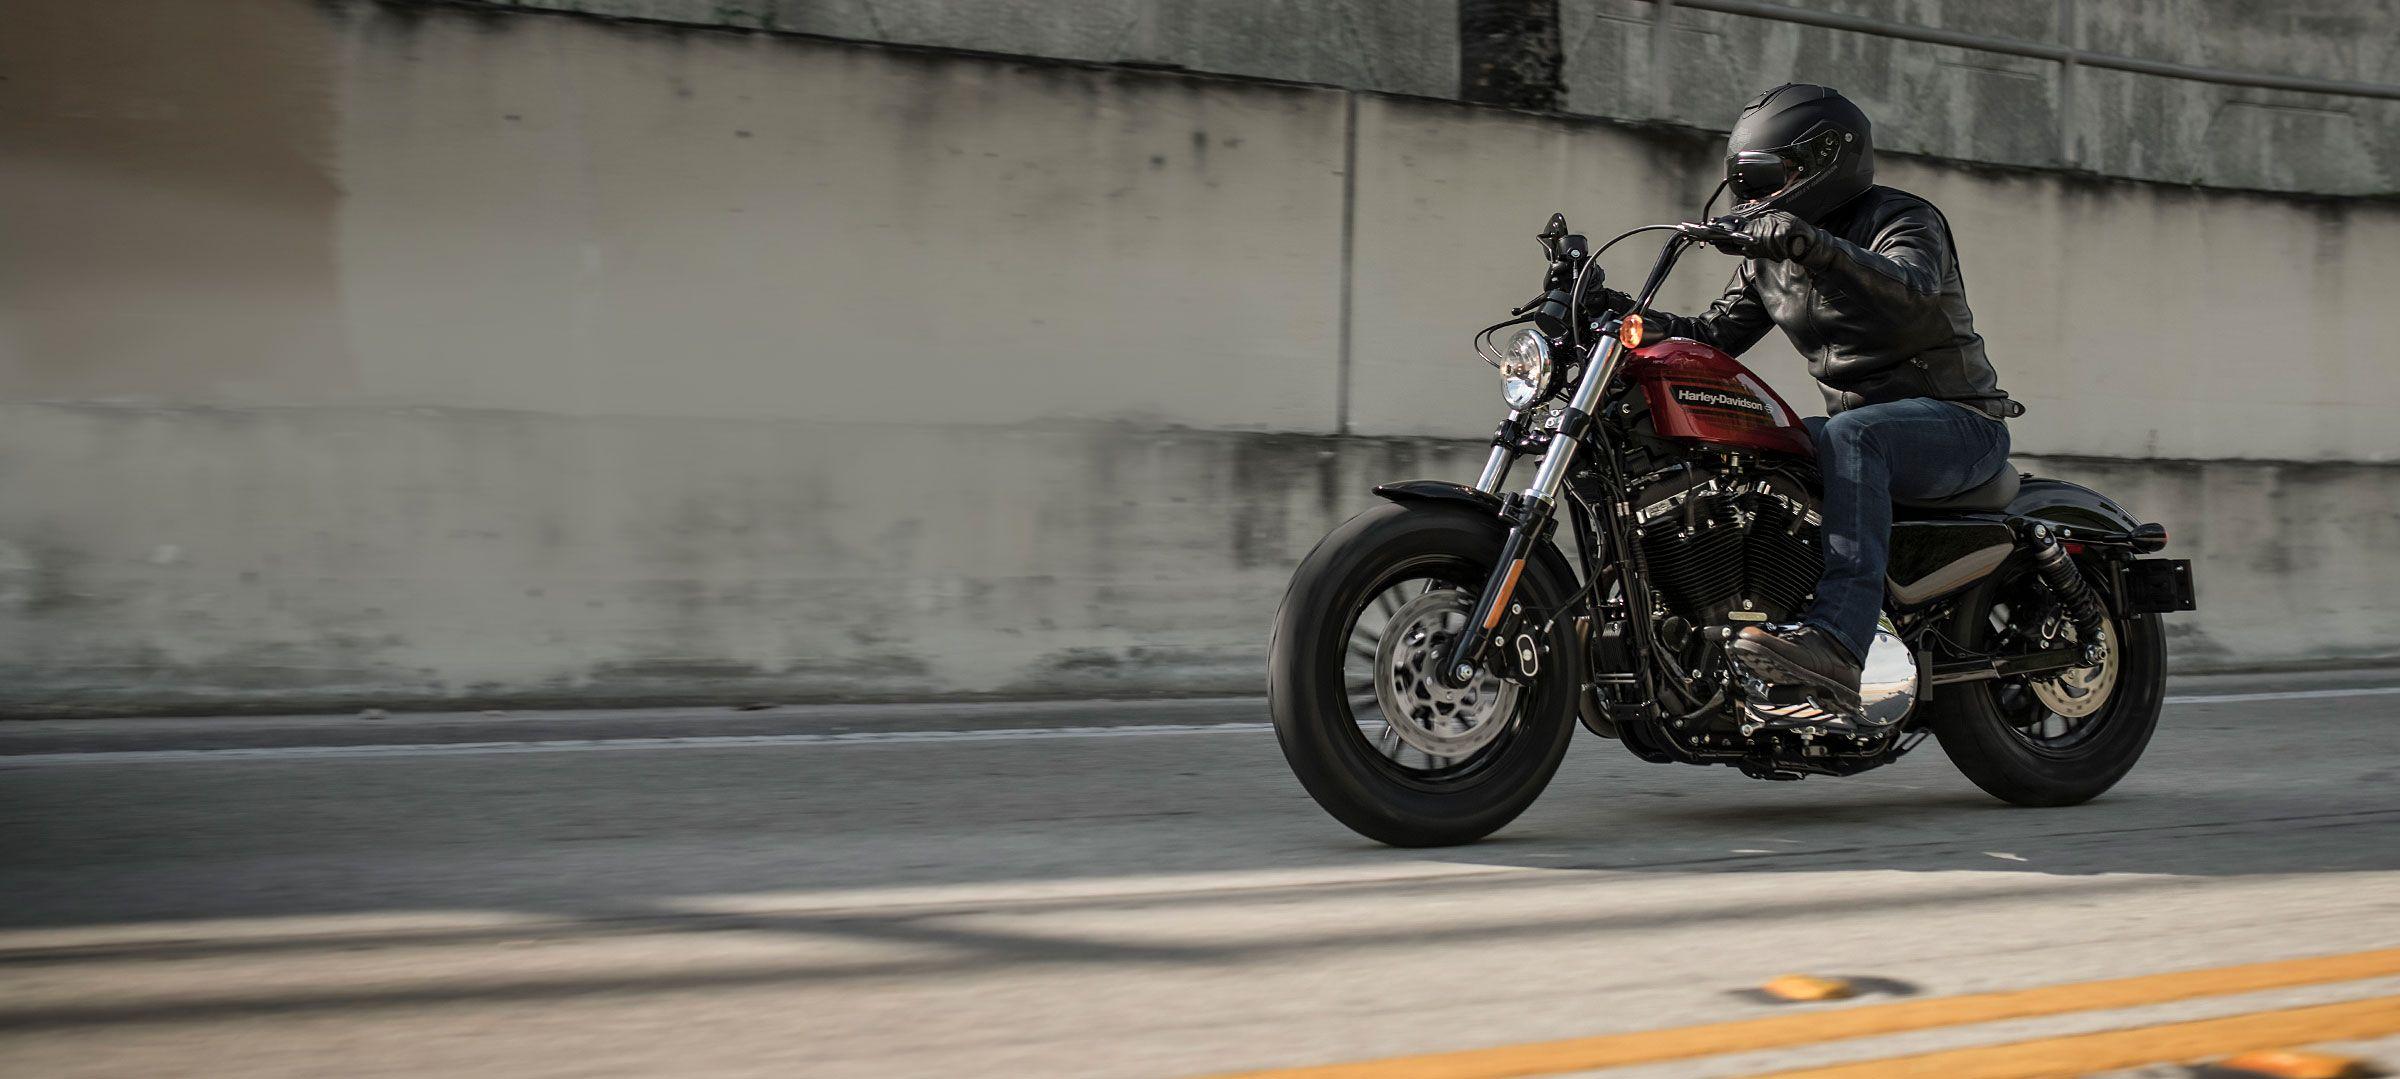 Harley Davidson Of Manila